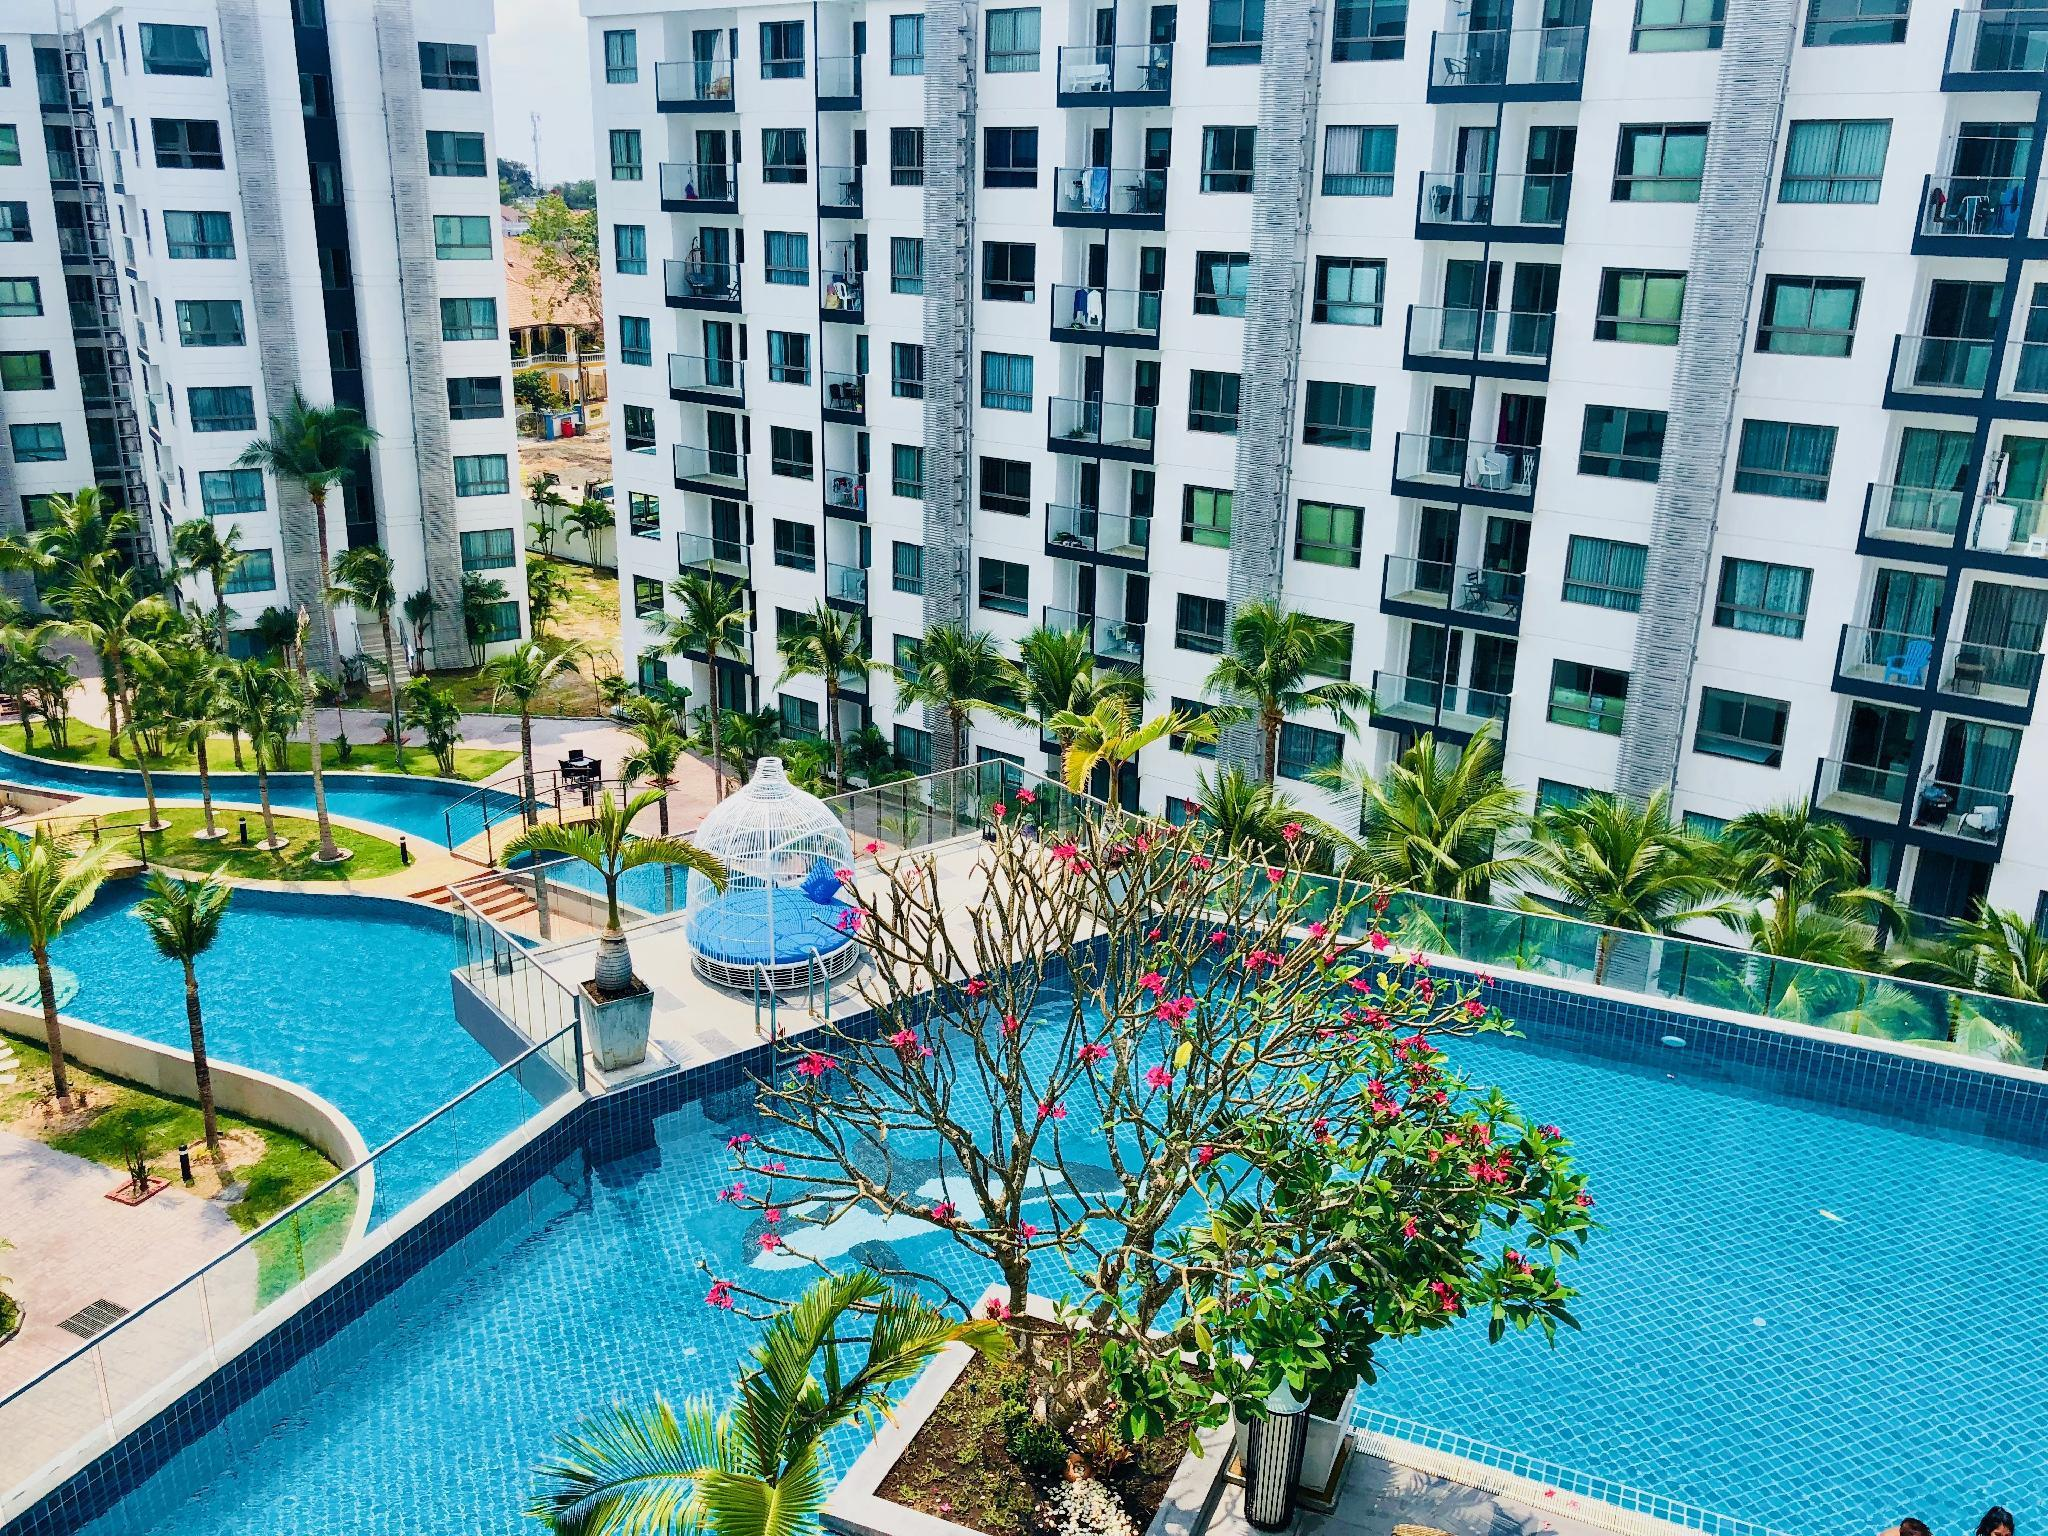 MayFlower@Arcadia Beach Resort Condominium อพาร์ตเมนต์ 1 ห้องนอน 1 ห้องน้ำส่วนตัว ขนาด 33 ตร.ม. – เขาพระตำหนัก